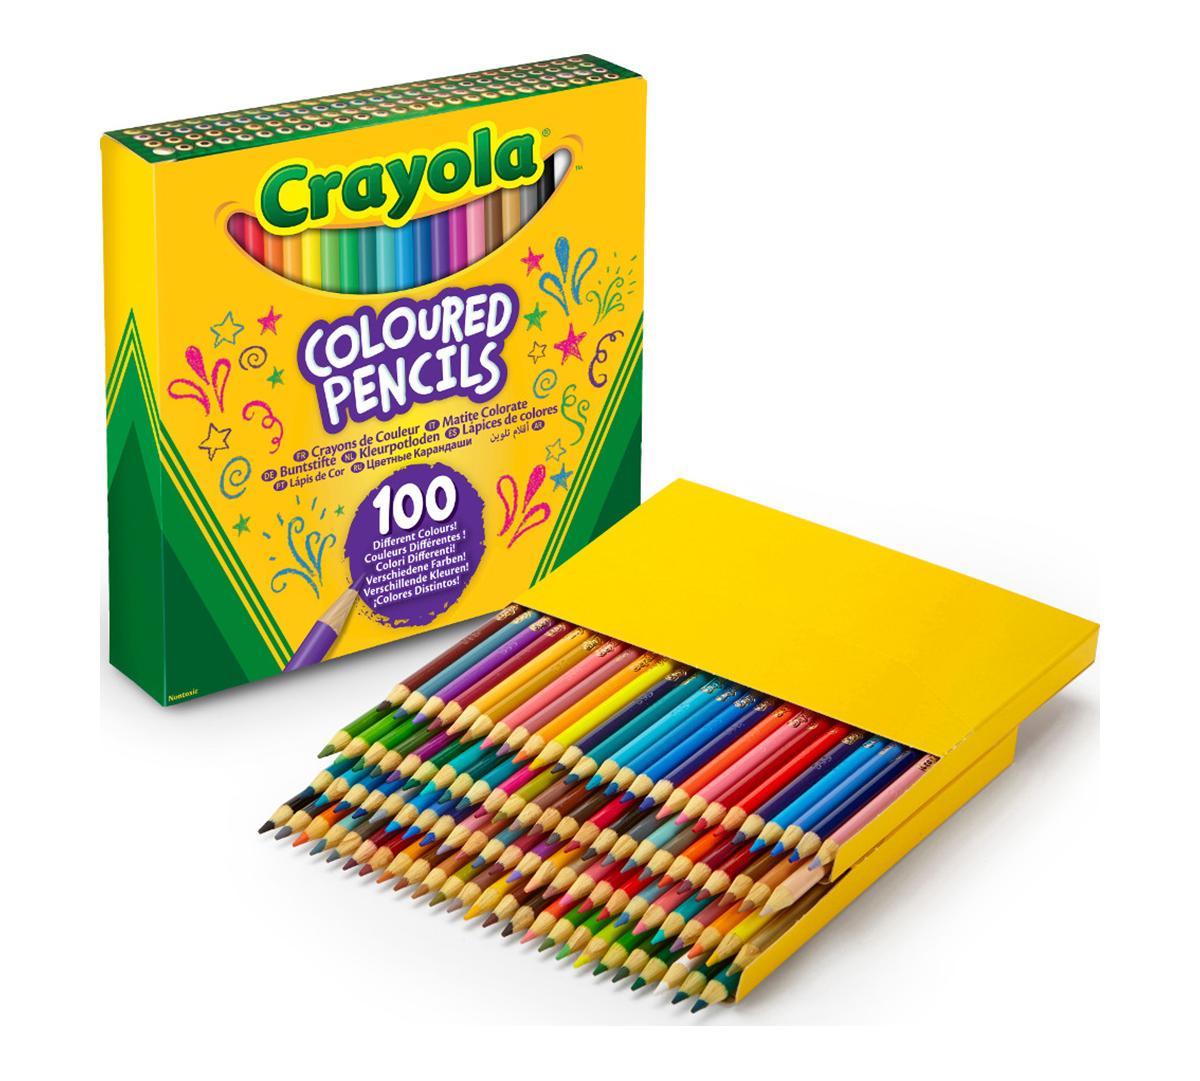 crayola colored pencils  100 count  vibrant colors  pre